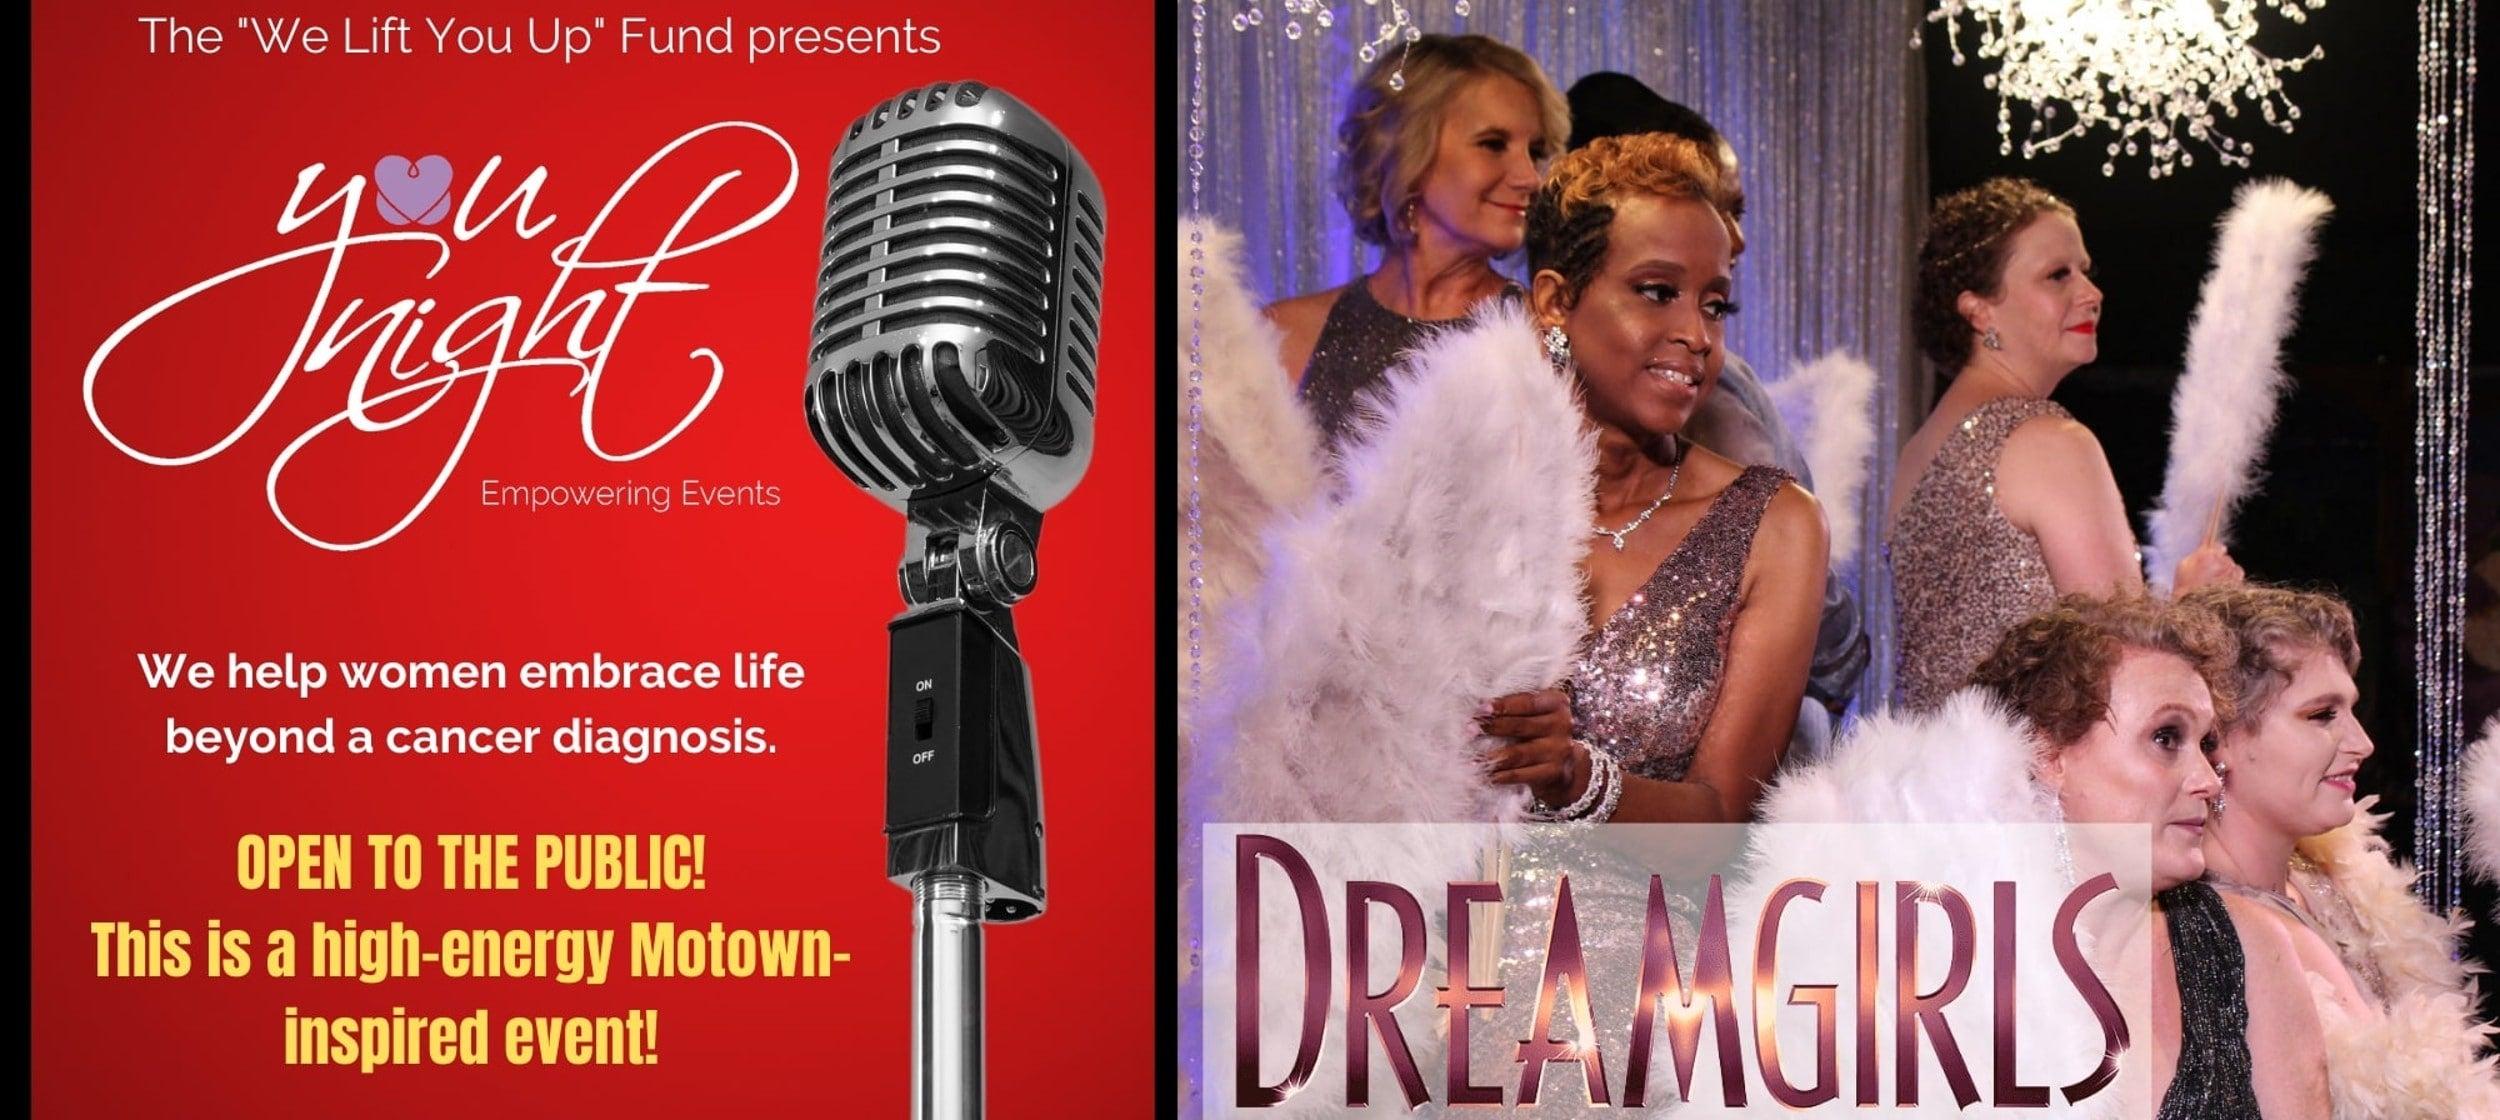 DREAMGIRLS: A Motown-inspired Runway Show